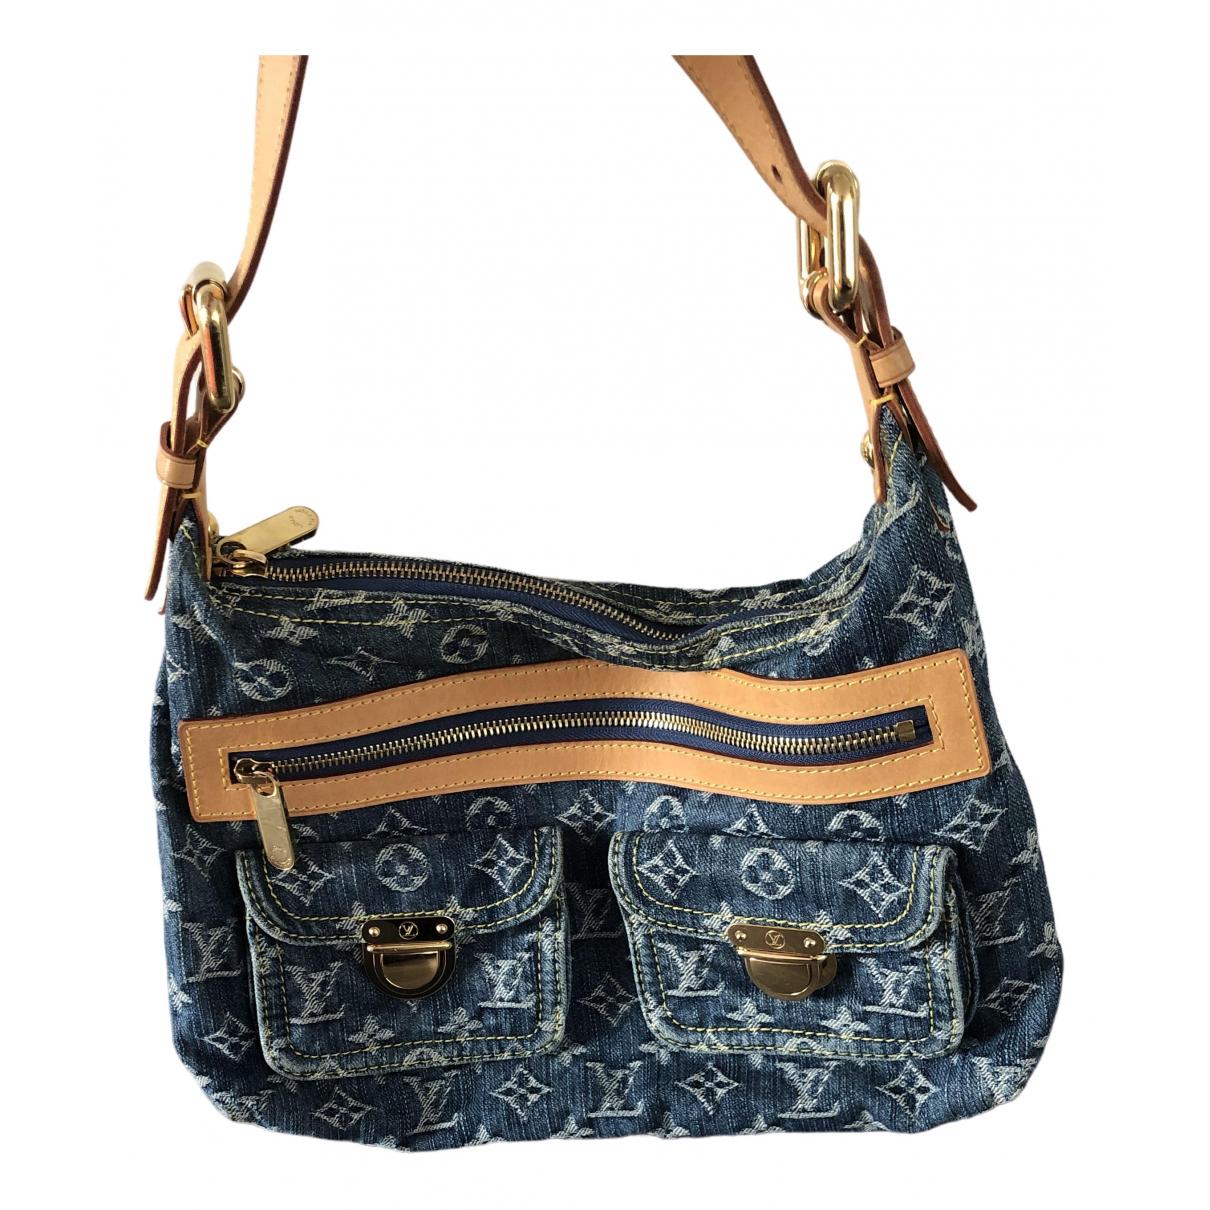 Louis Vuitton - Sac a main Baggy pour femme en denim - bleu